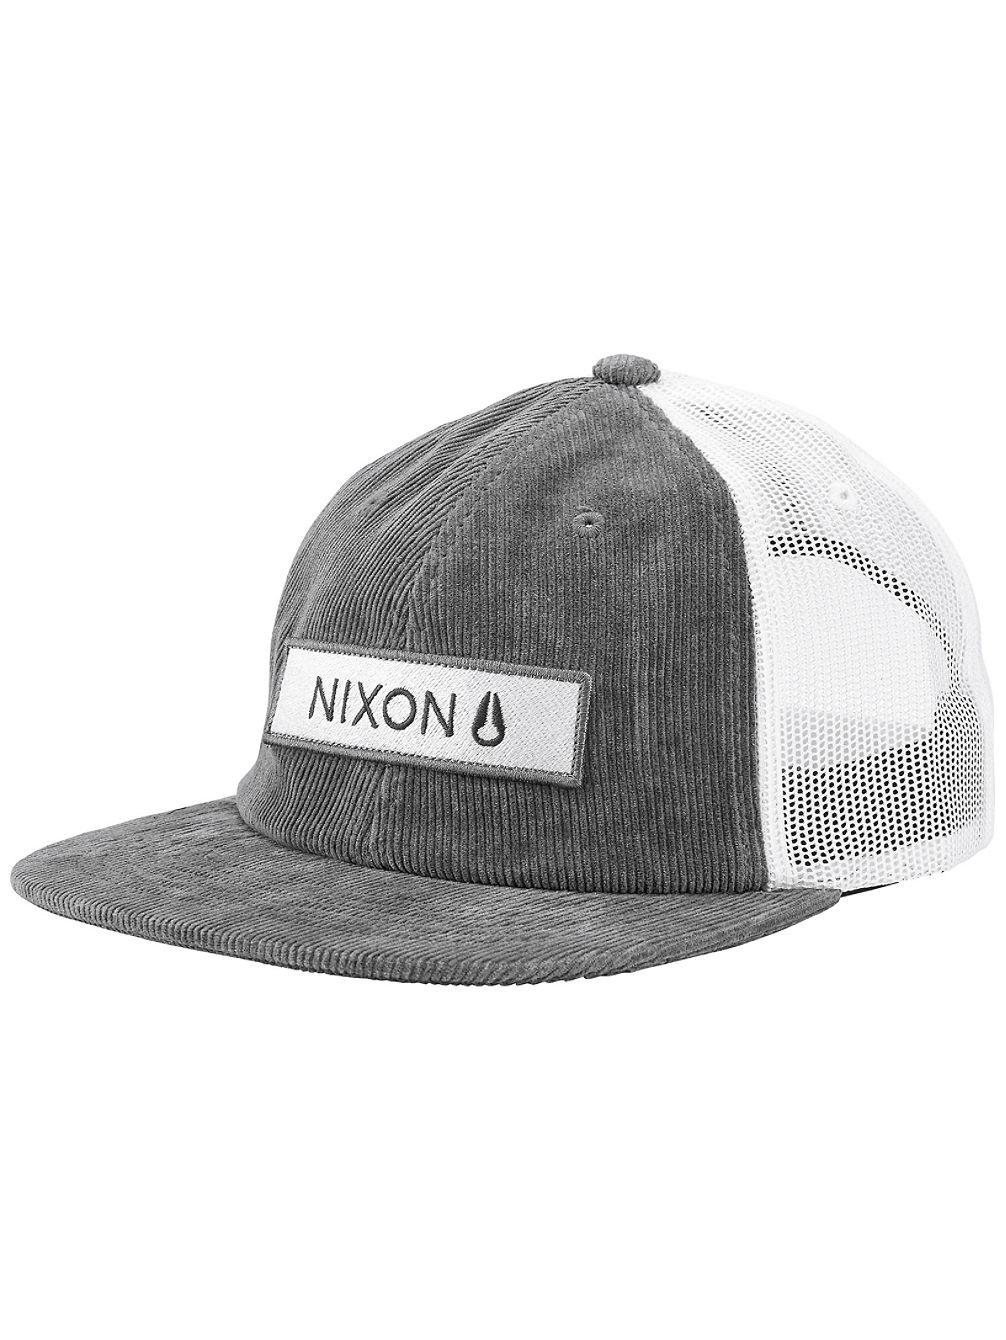 d9c54392e9c67 Buy Nixon Goleta Trucker Cap online at Blue Tomato